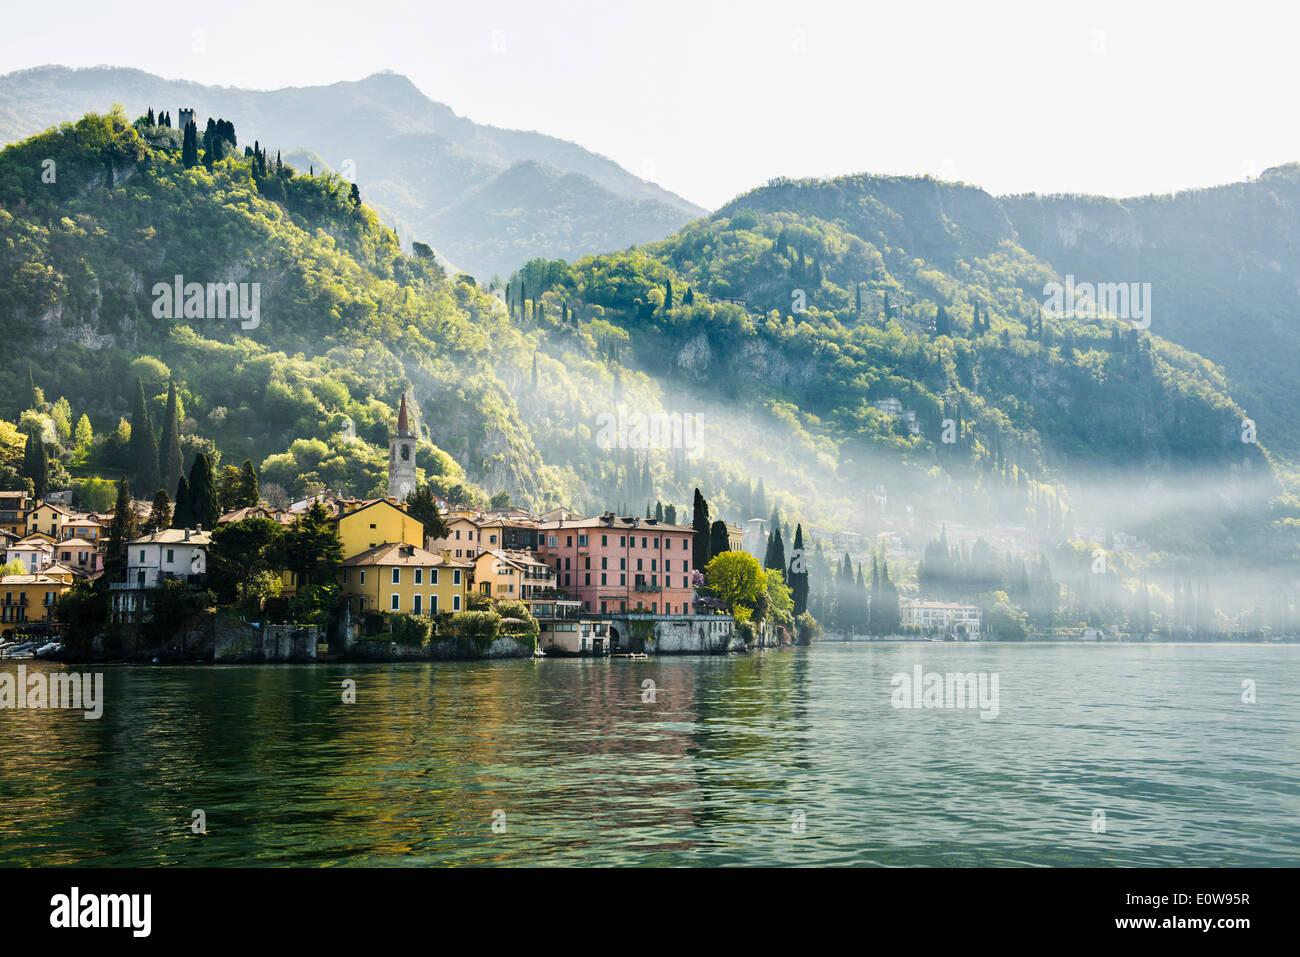 Village on the lake, Varenna, Lake Como, Lago di Como, Lecco province, Lombardy, Italy - Stock Image